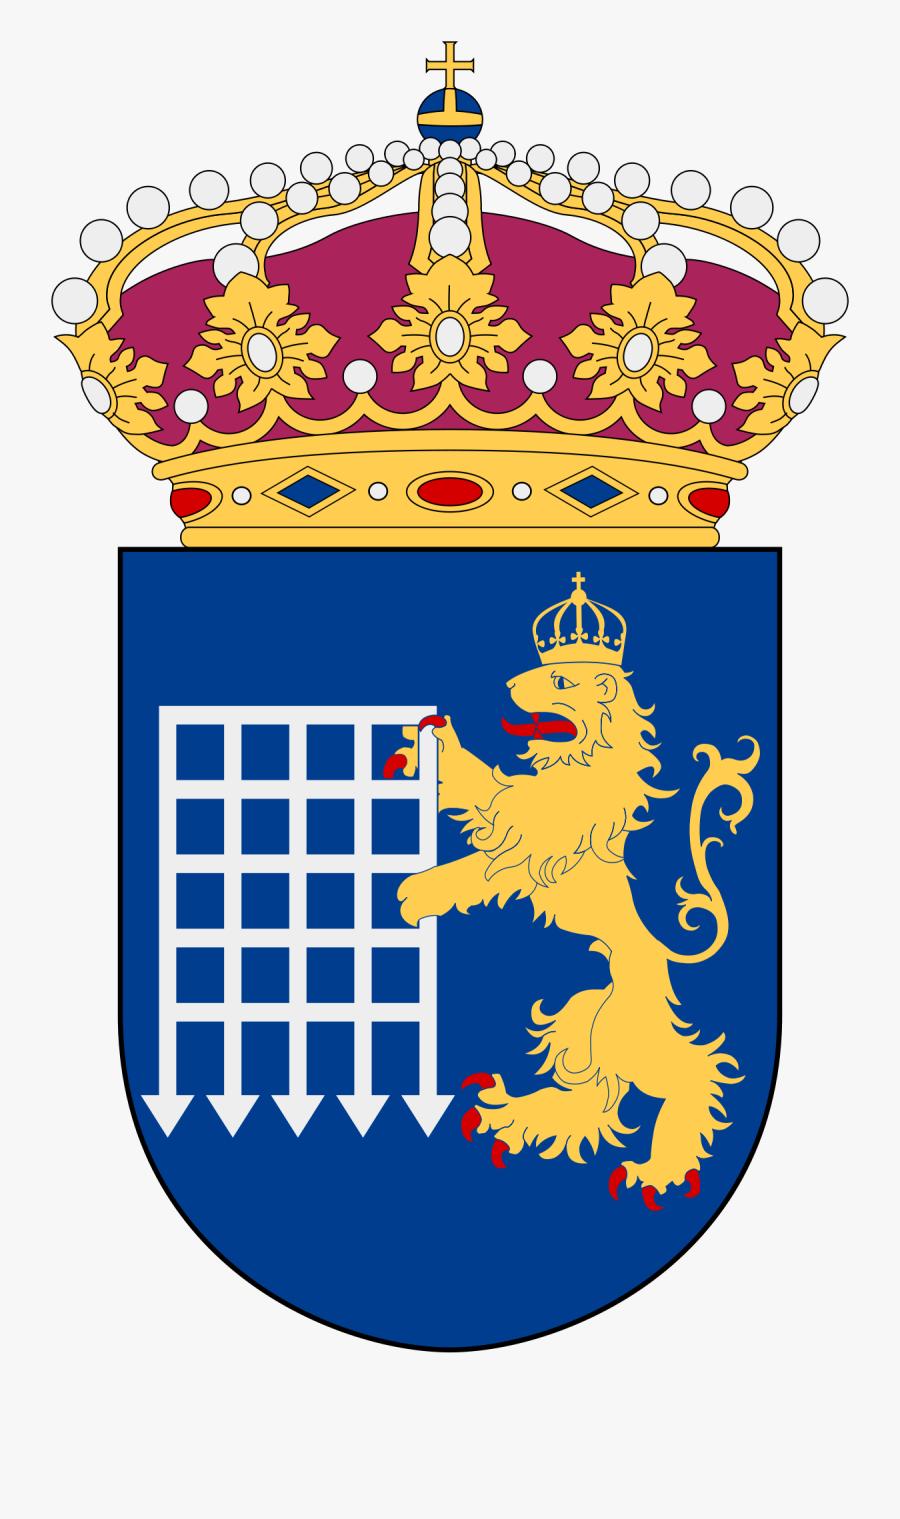 Swedish Service Wikipedia - National Defence Radio Establishment, Transparent Clipart